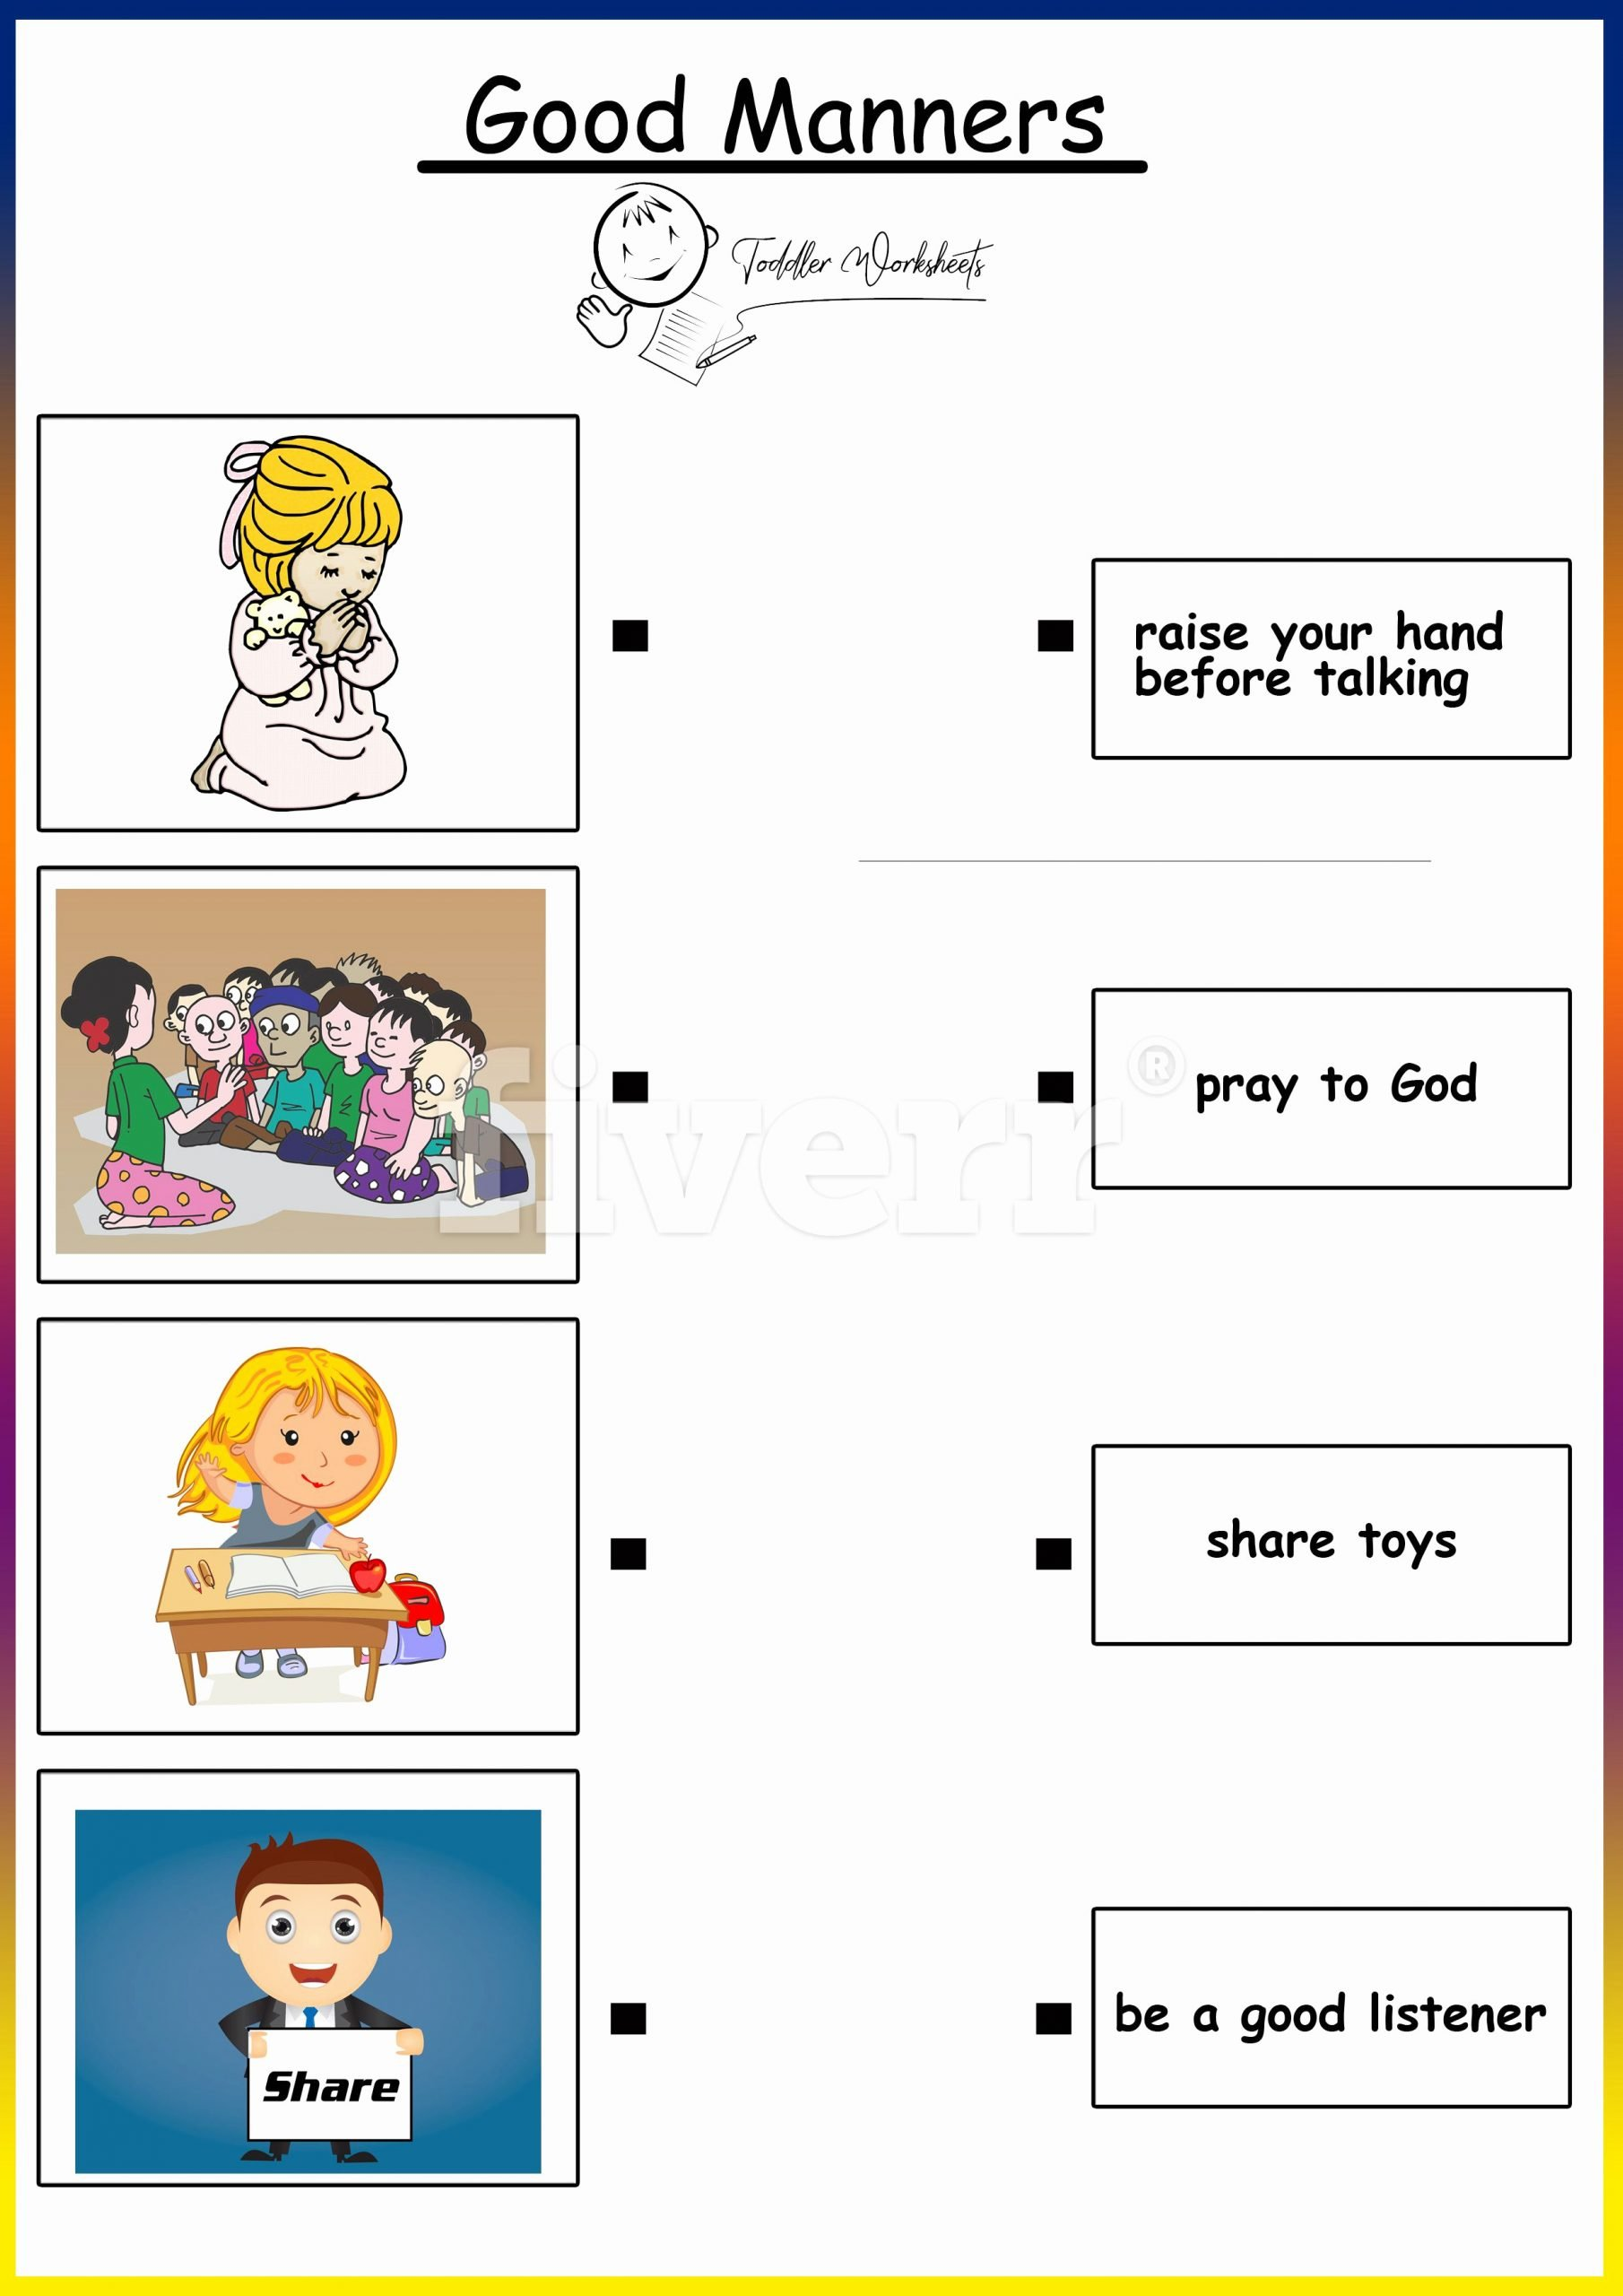 Manners Worksheets for Preschoolers Free Preschool Free Worksheets Good Manners